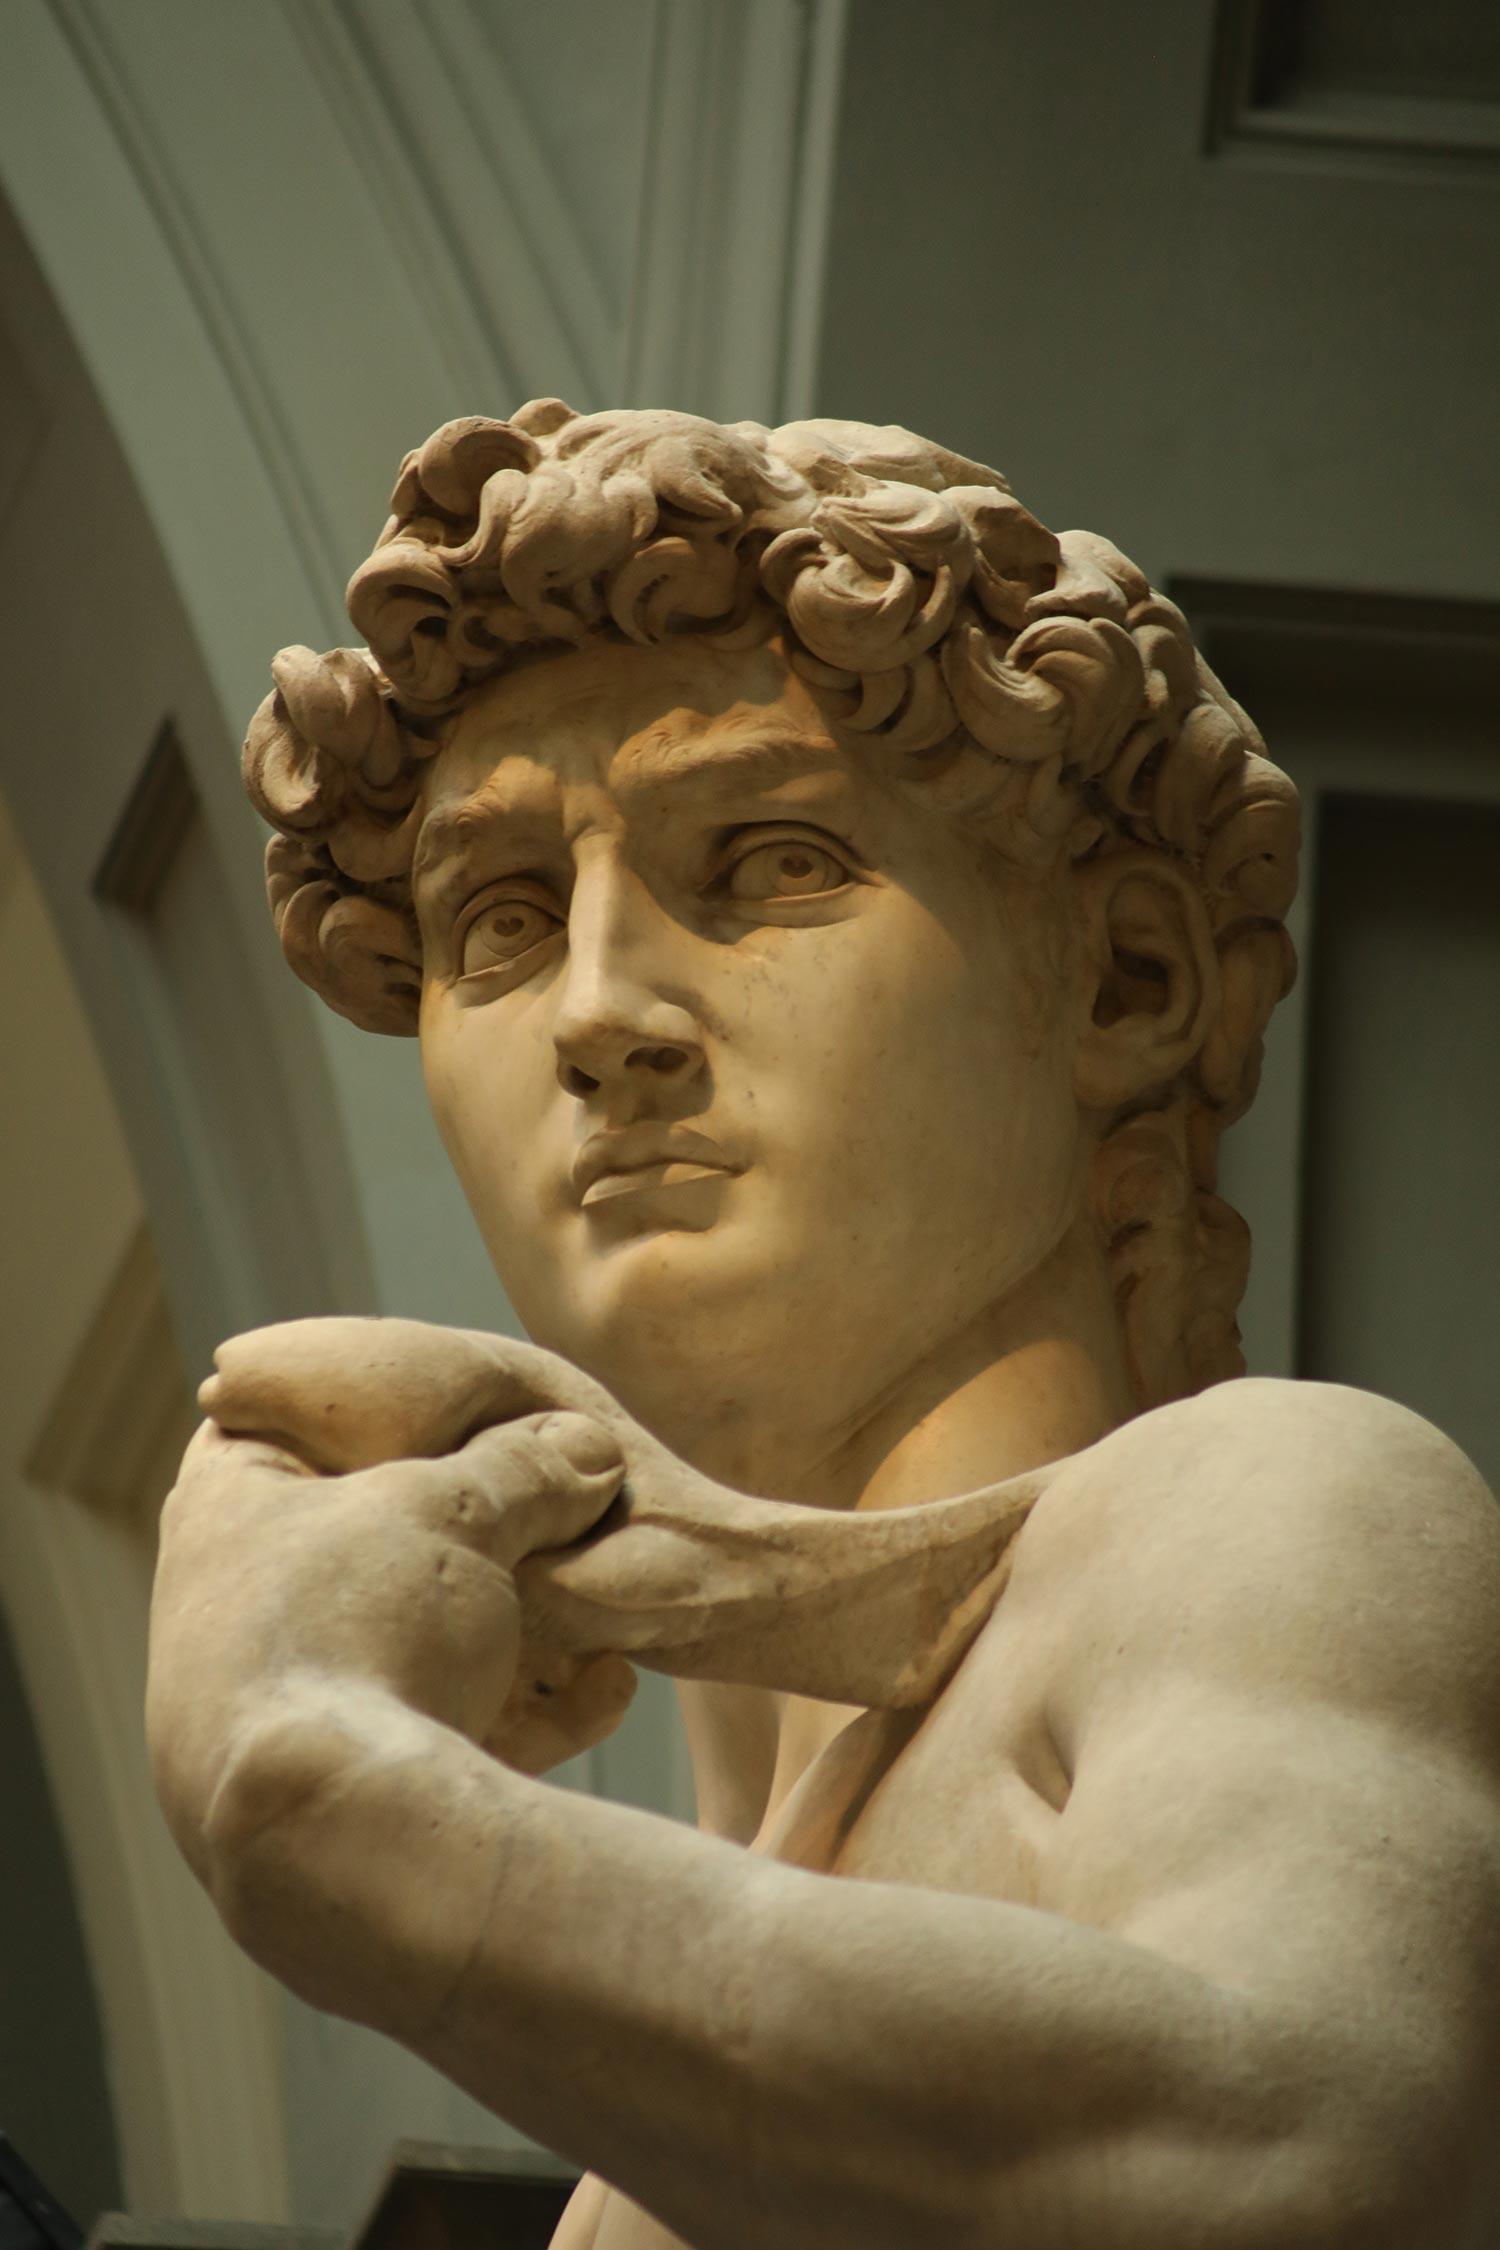 Pilgrimage_Rome_4310_Florence.jpg